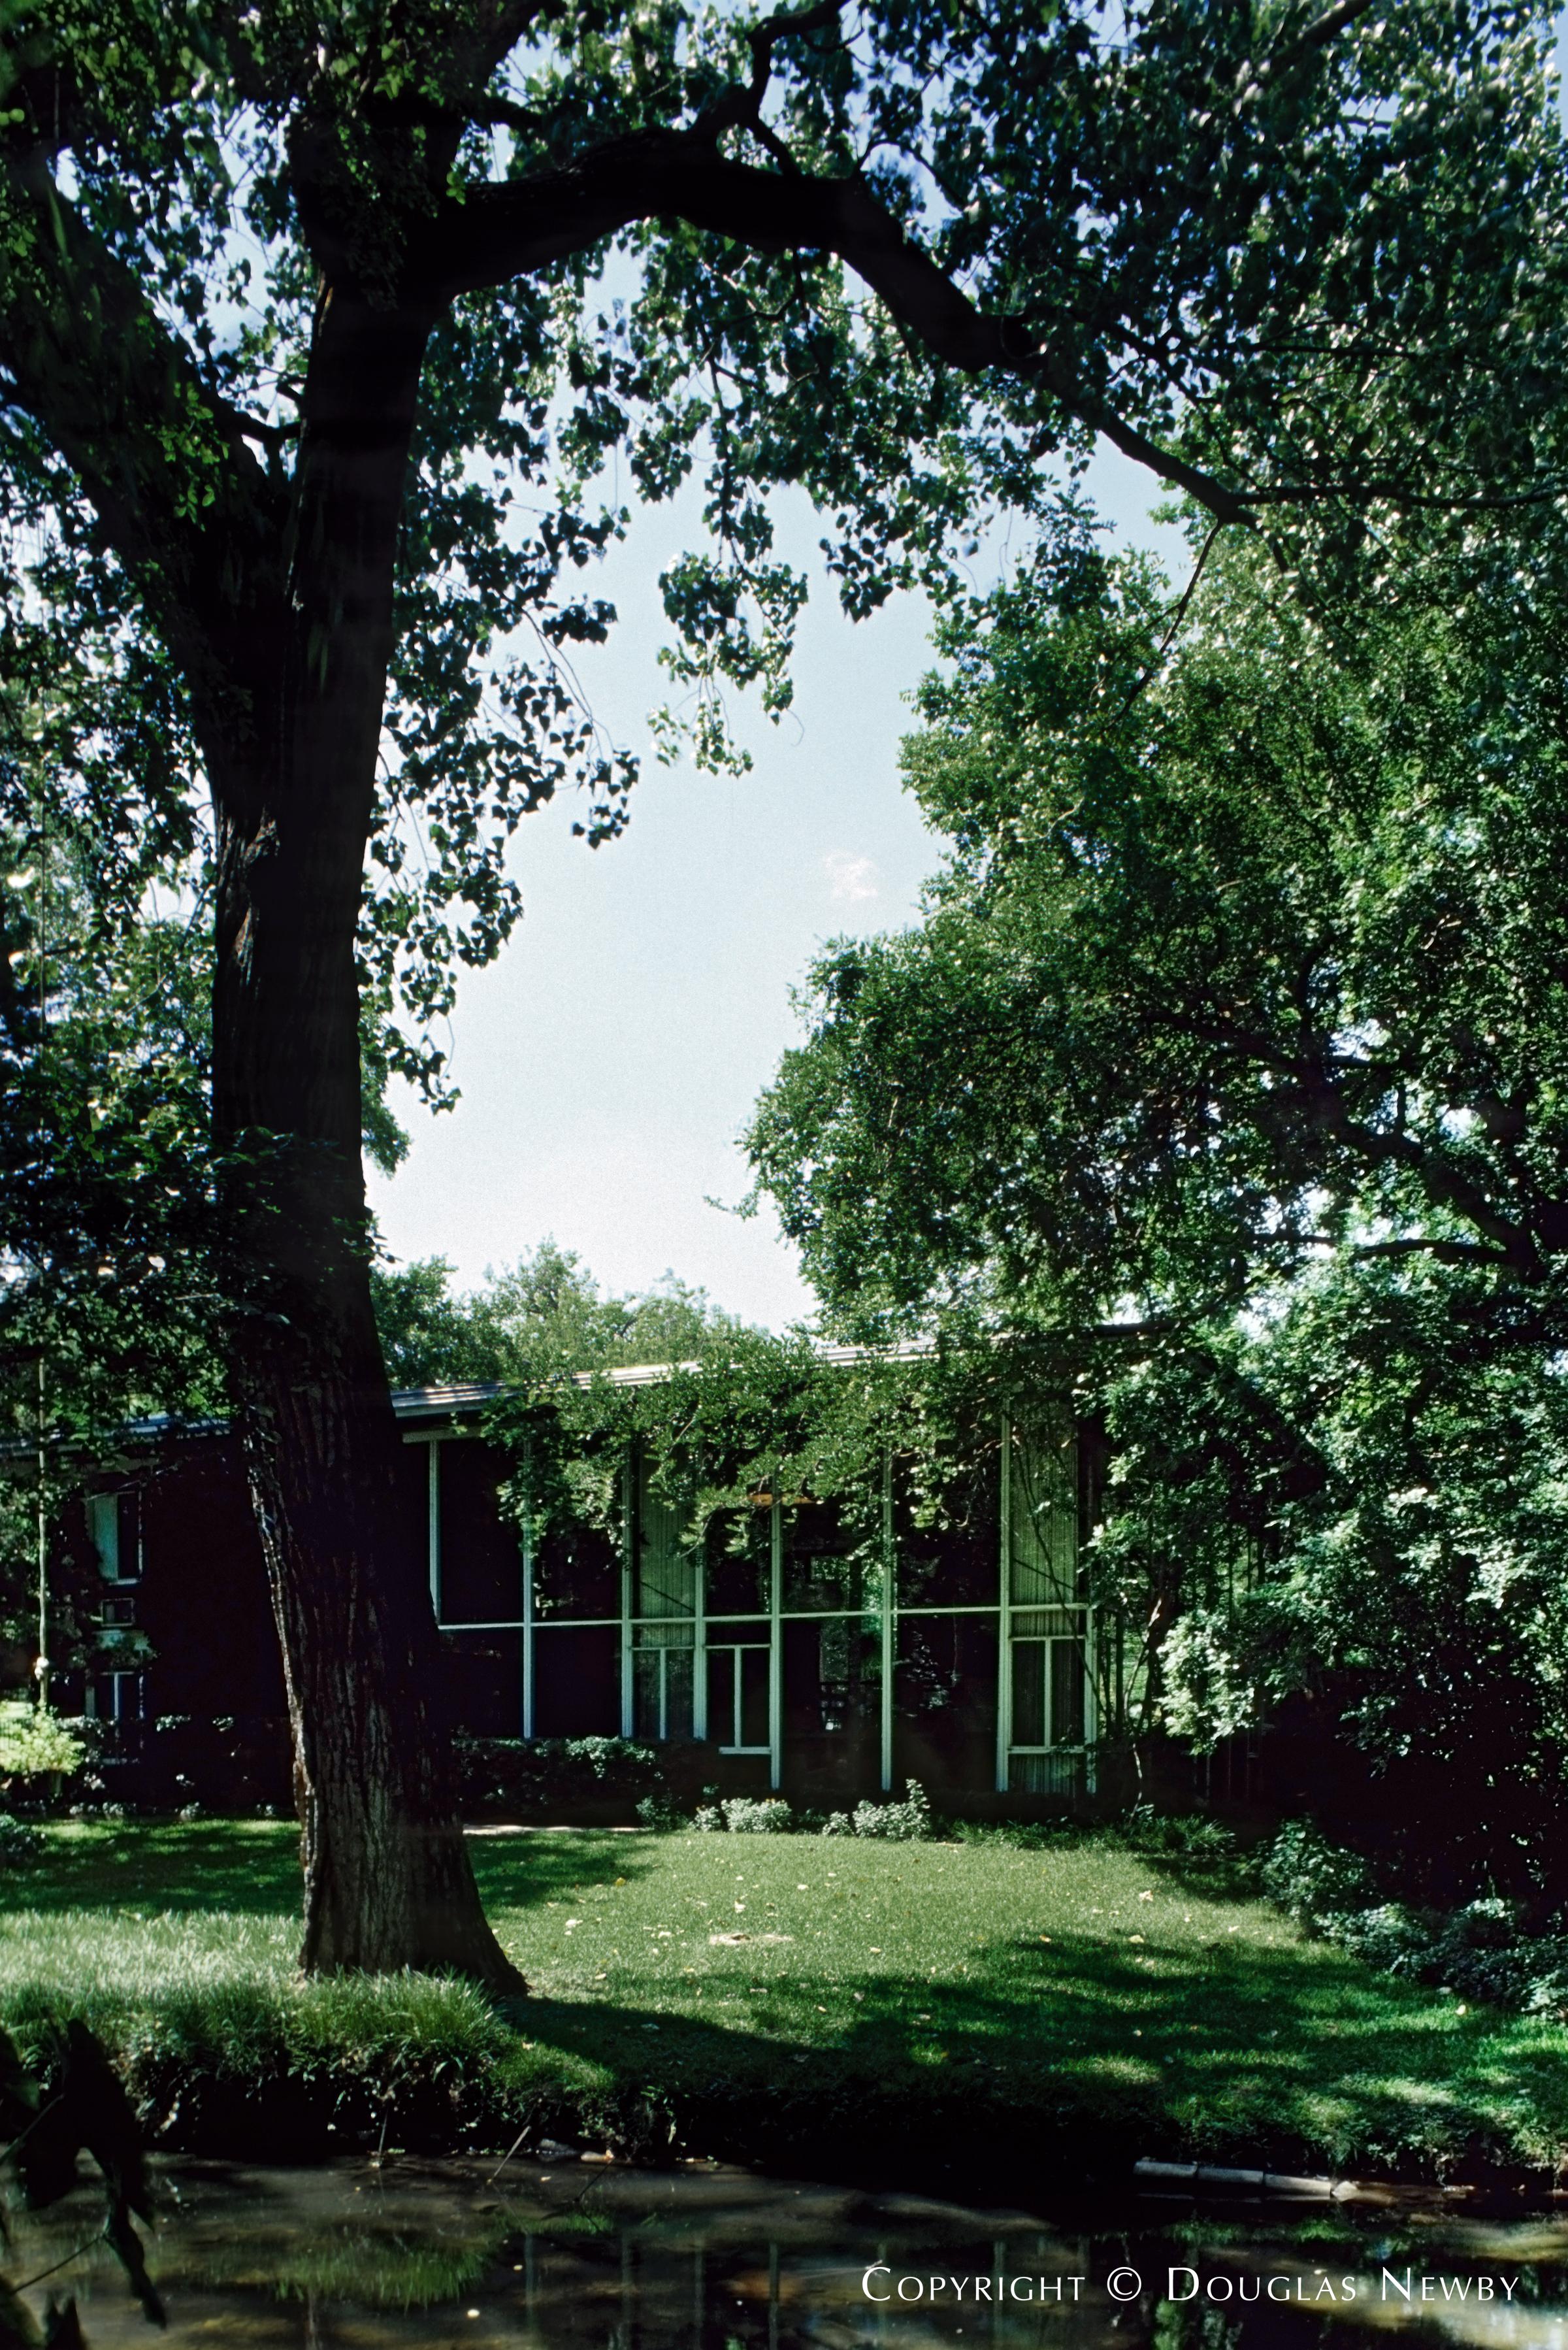 Highland Park Texas Modern Home sitting on 1.43 Acres